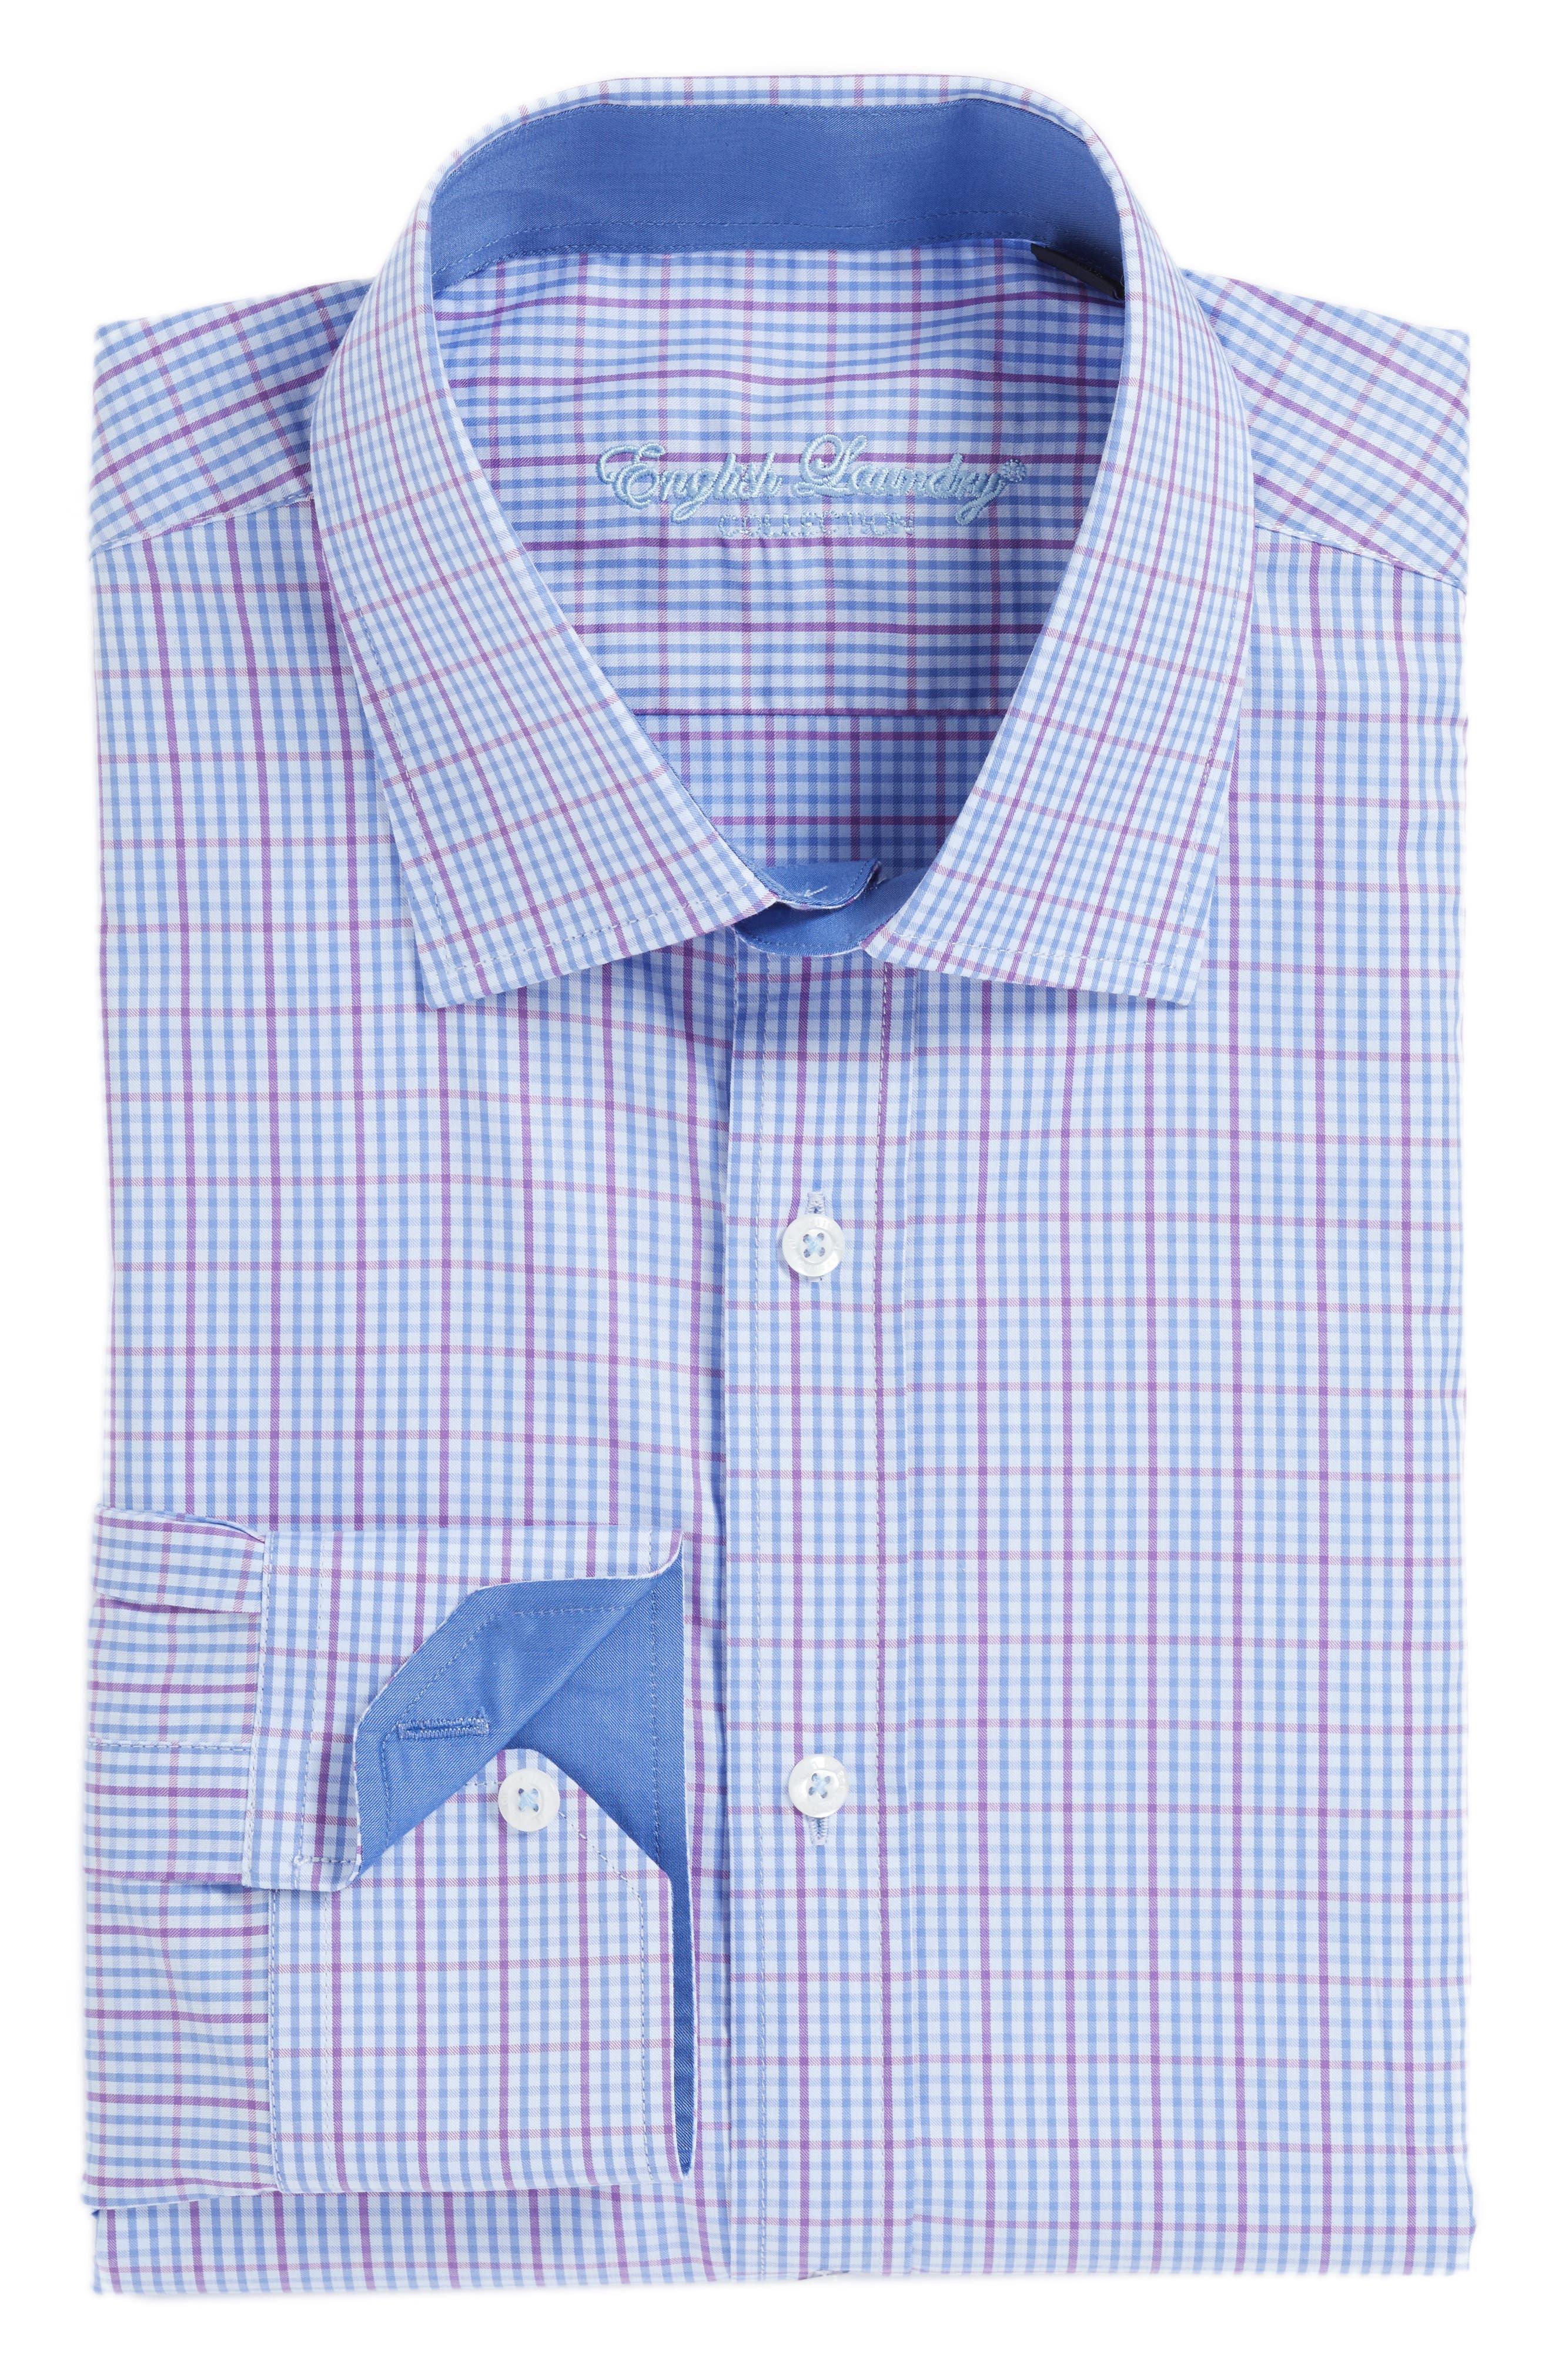 Main Image - English Laundry Trim Fit Check Dress Shirt